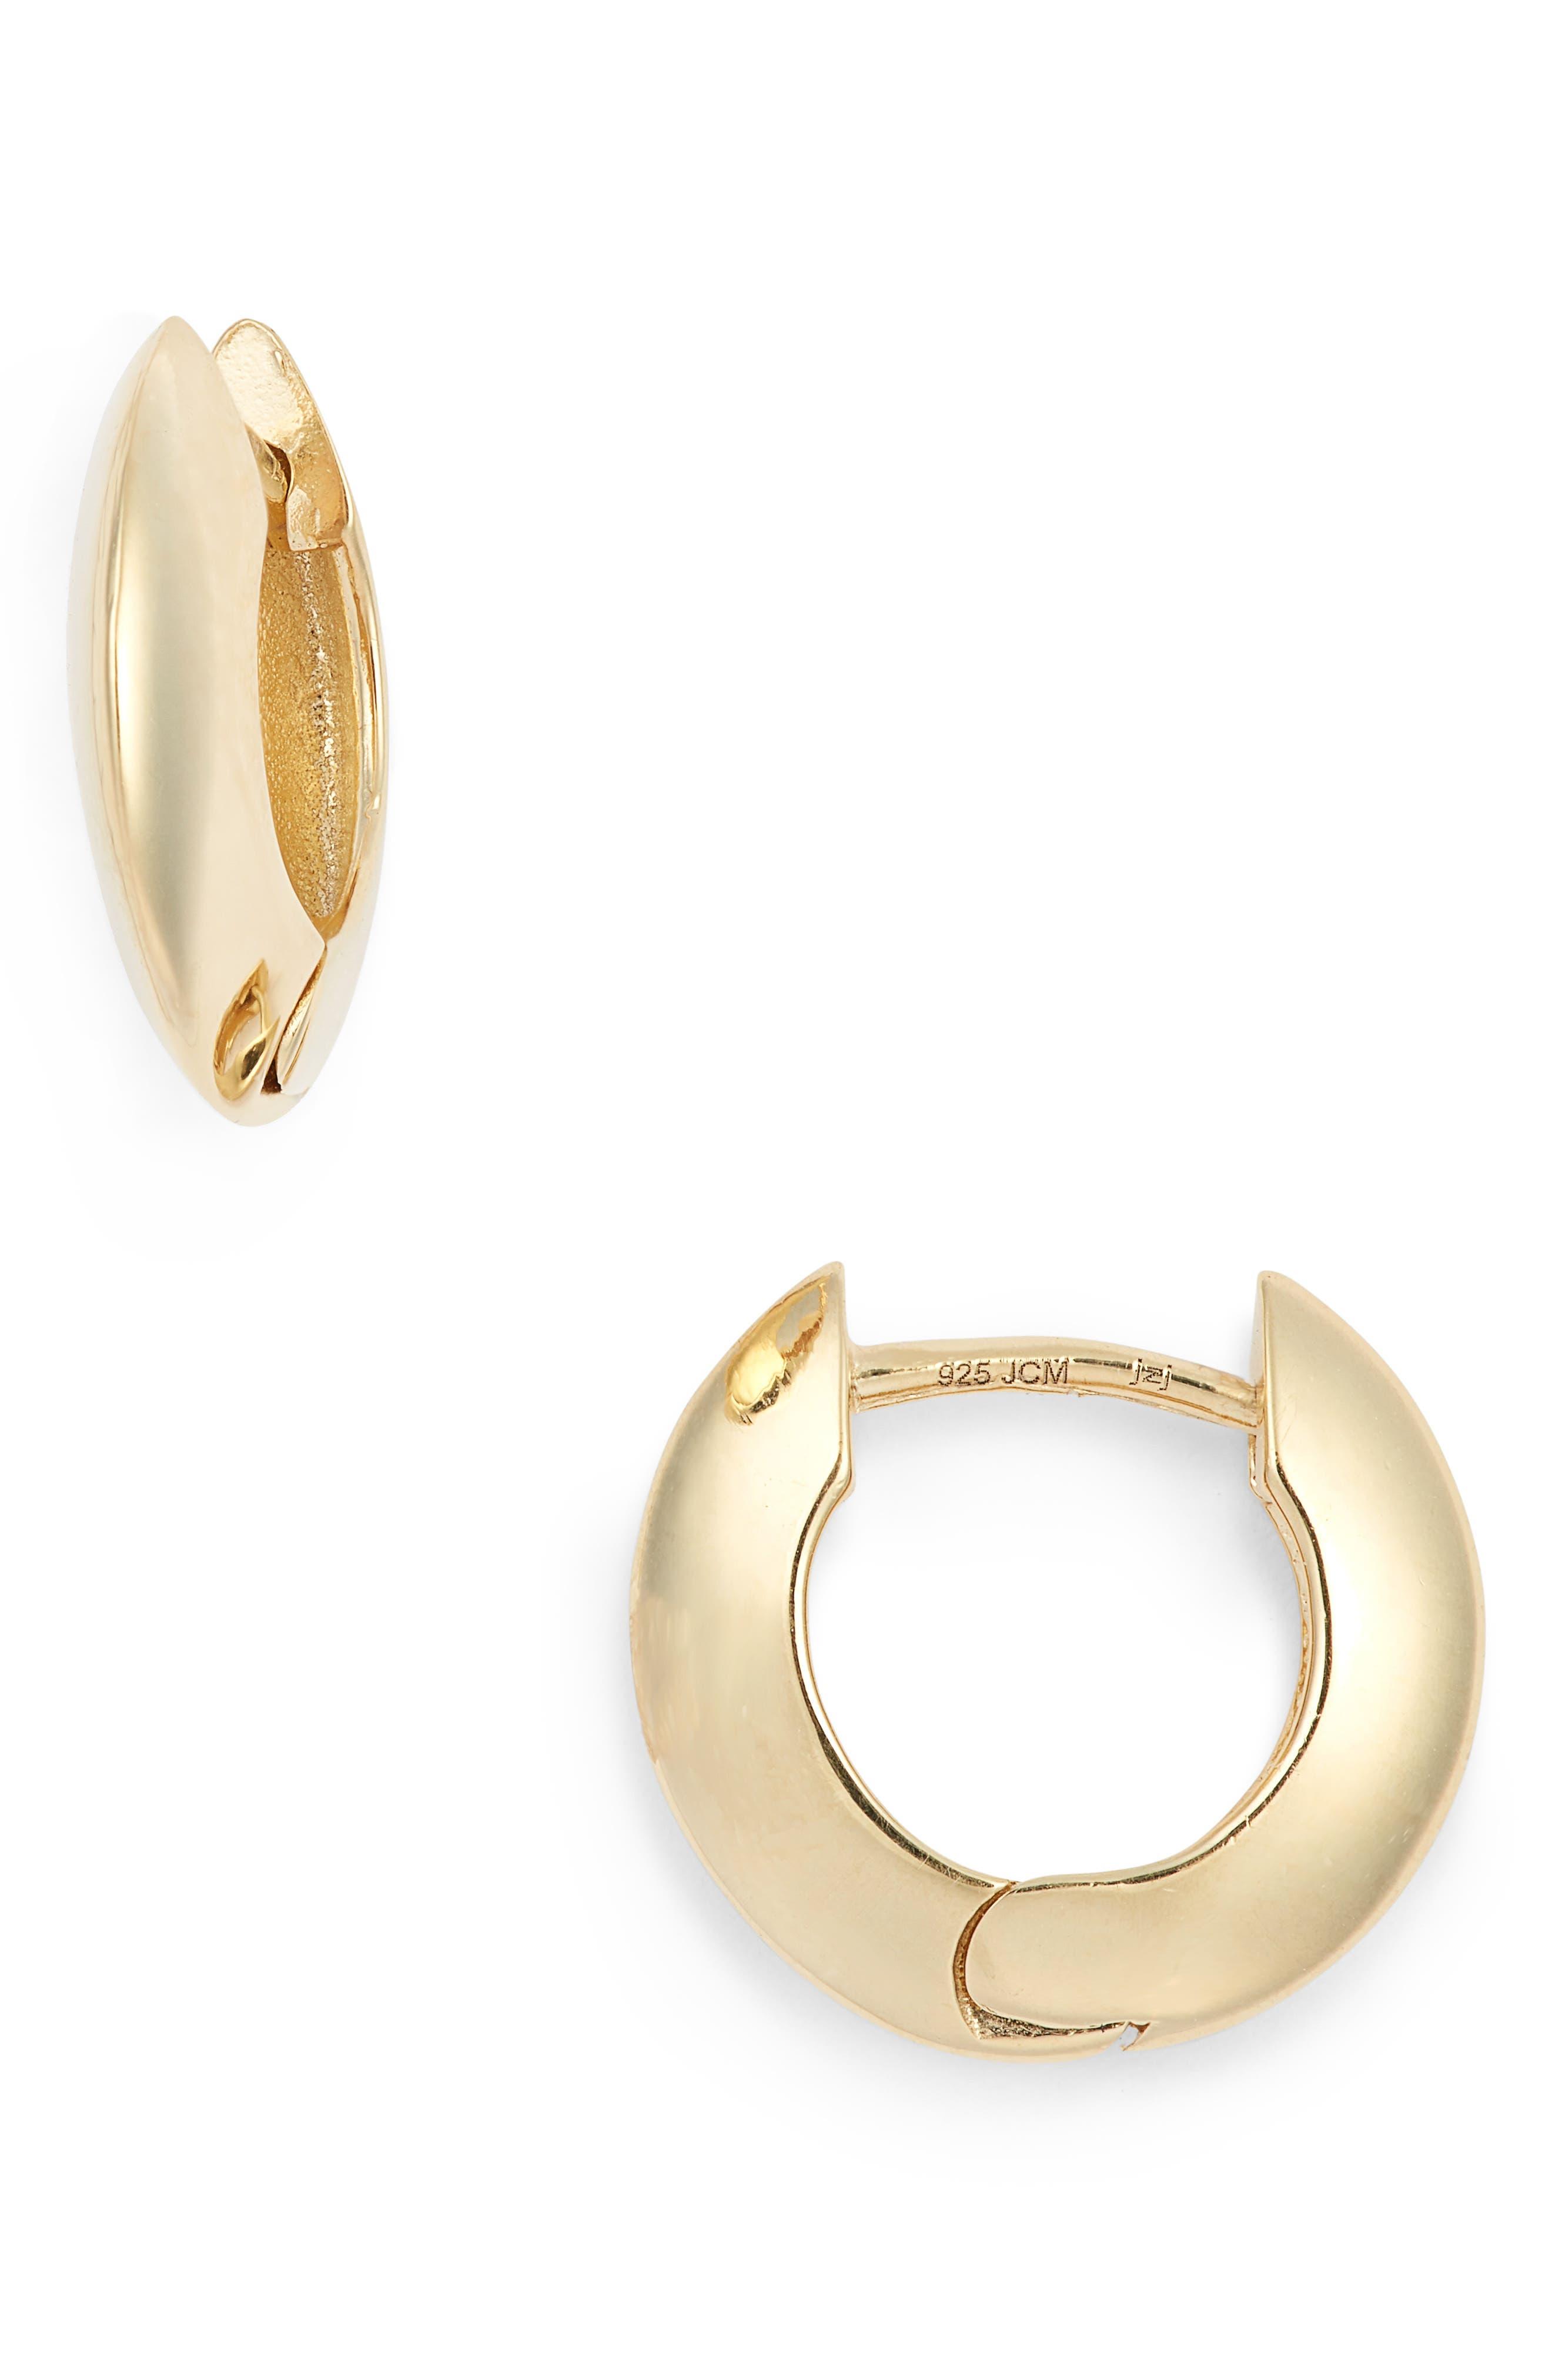 JENNIFER ZEUNER Farrah Huggie Earrings, Main, color, YELLOW VERMEIL